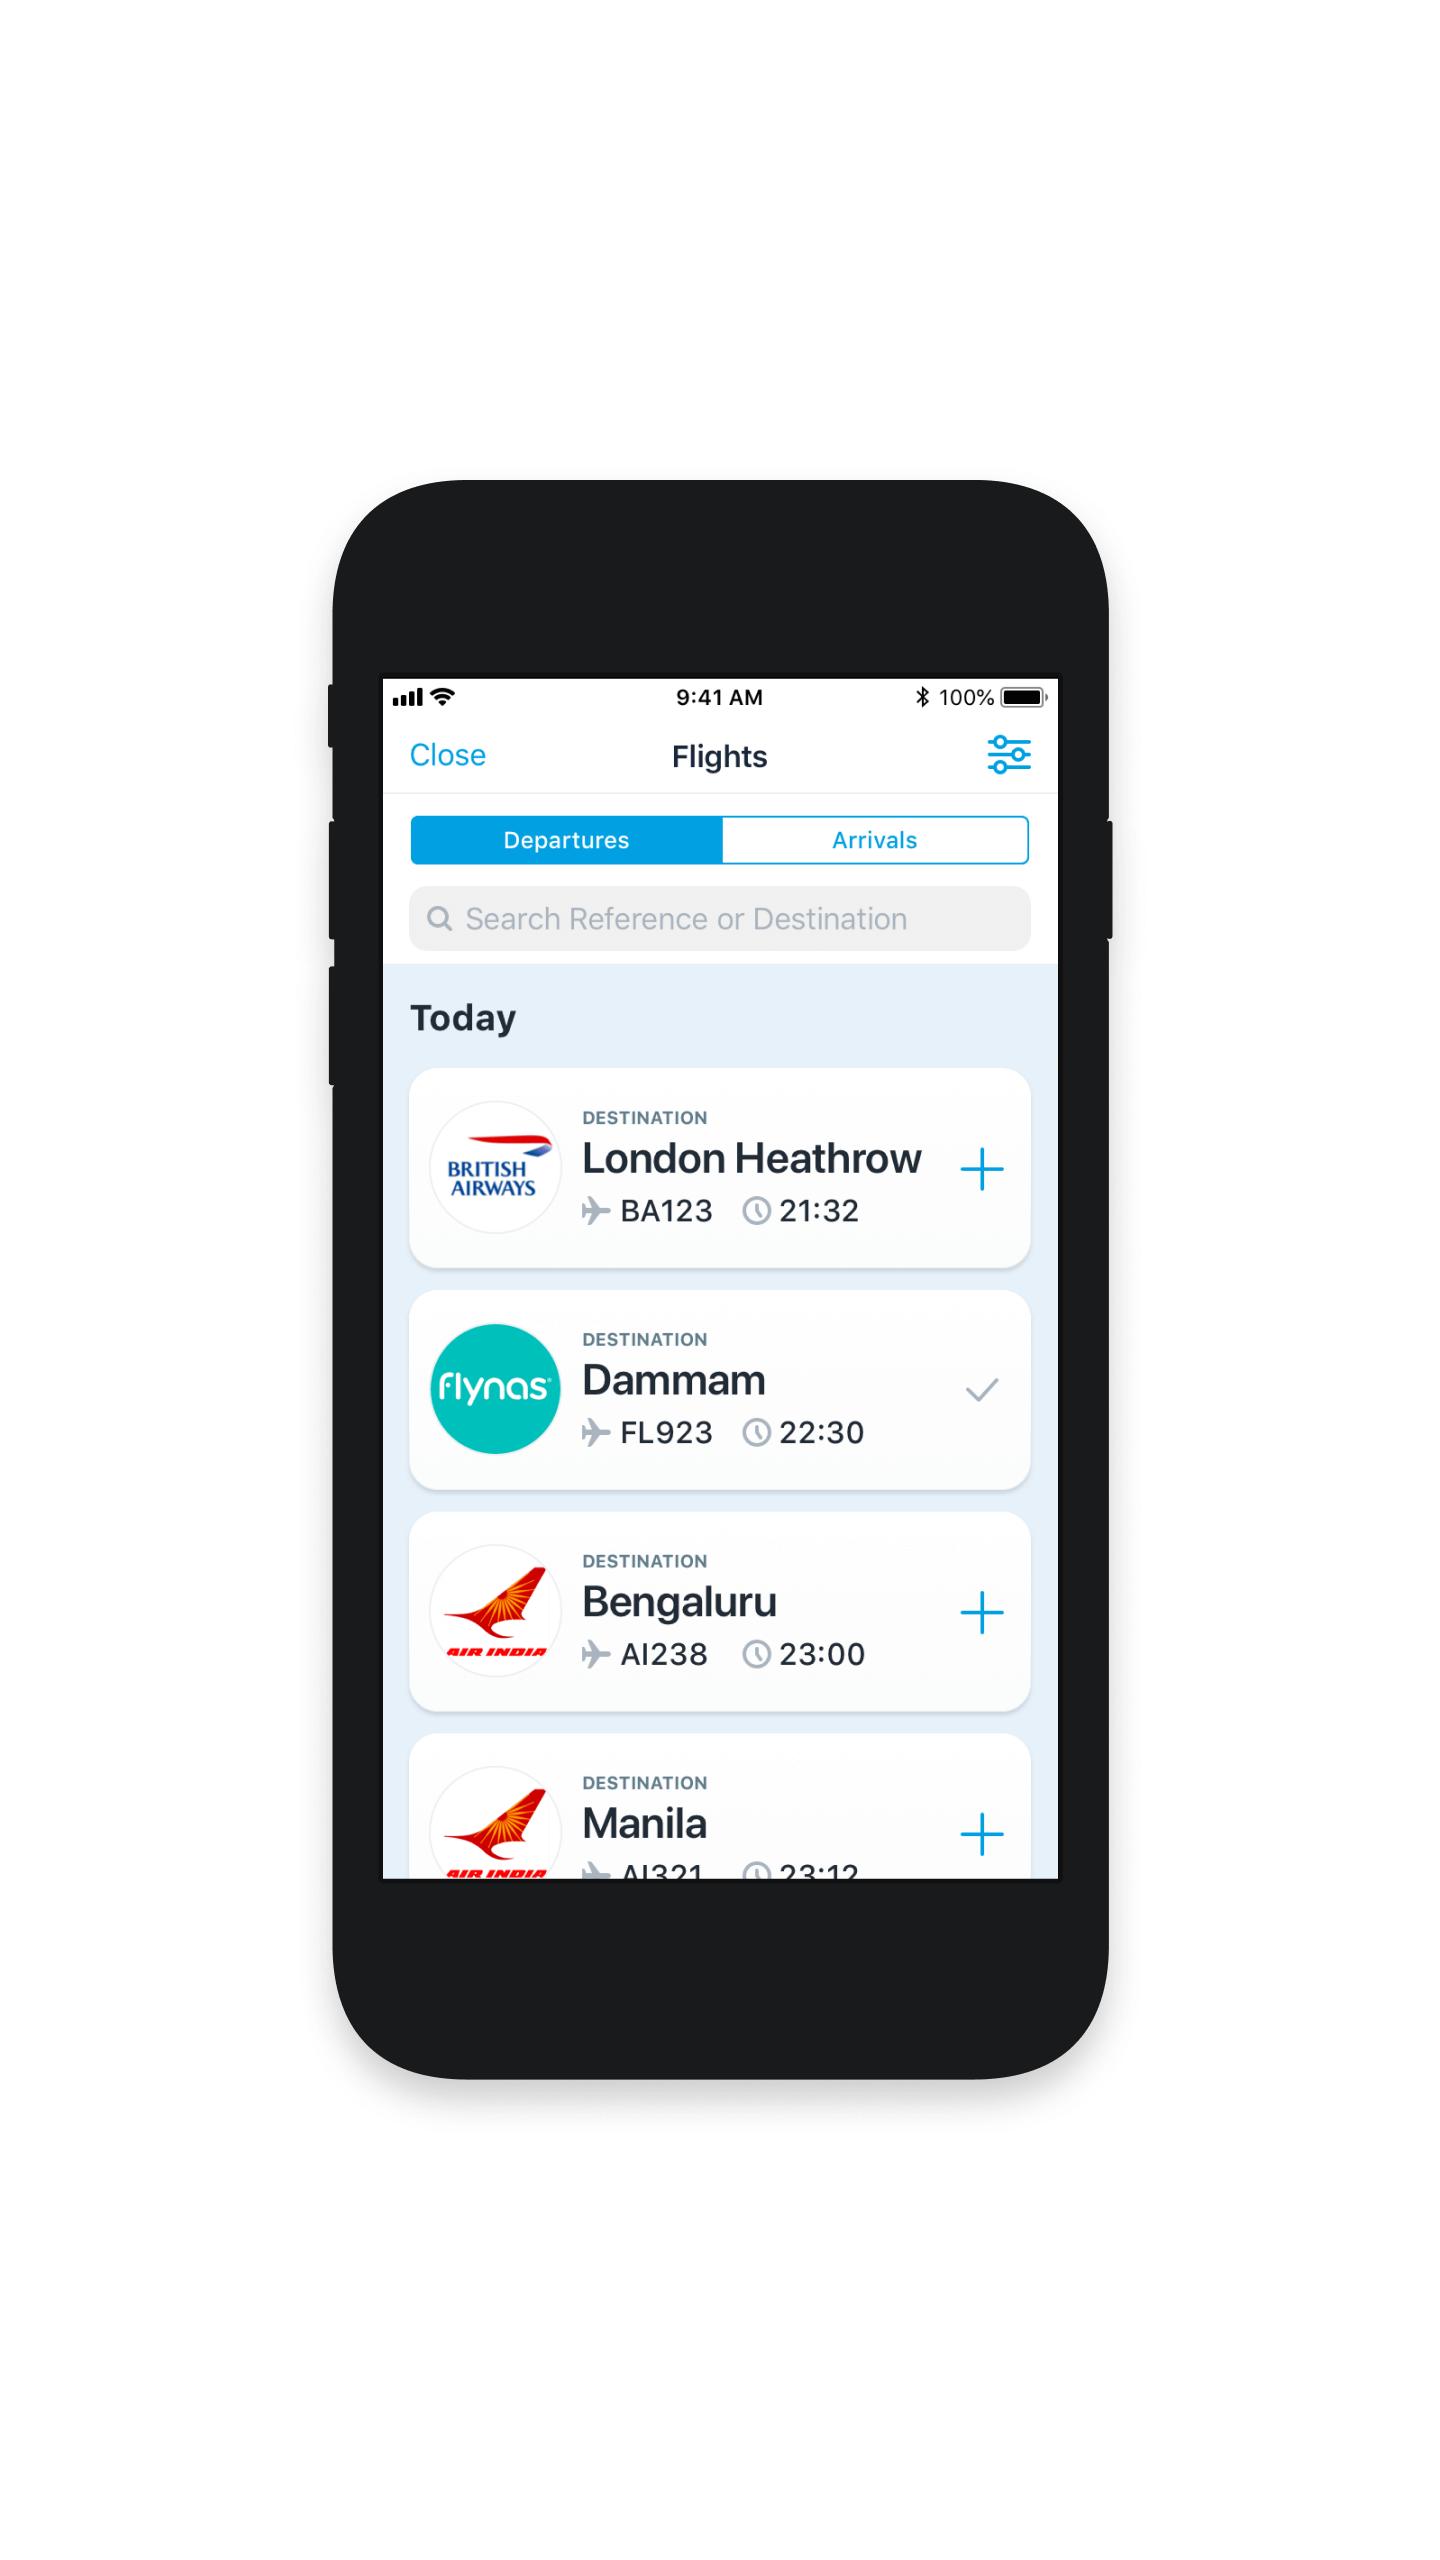 iOS app user interface (UI) for departure flights - Arabic version